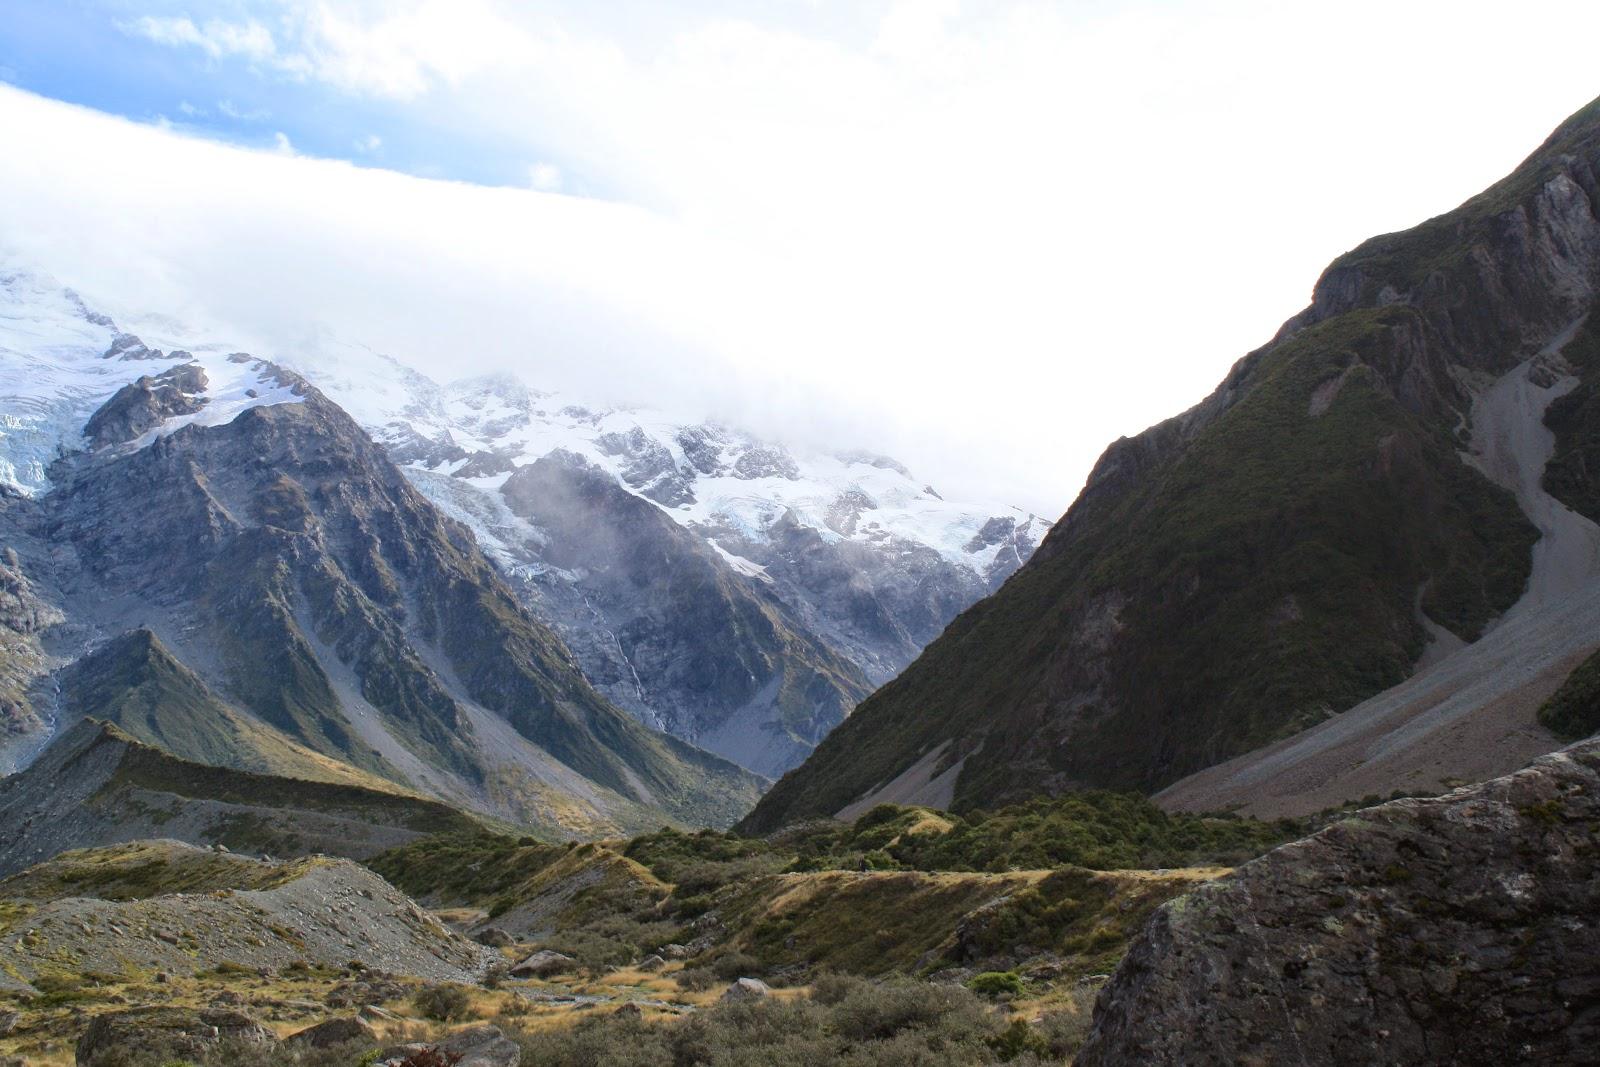 That's a mountain range.